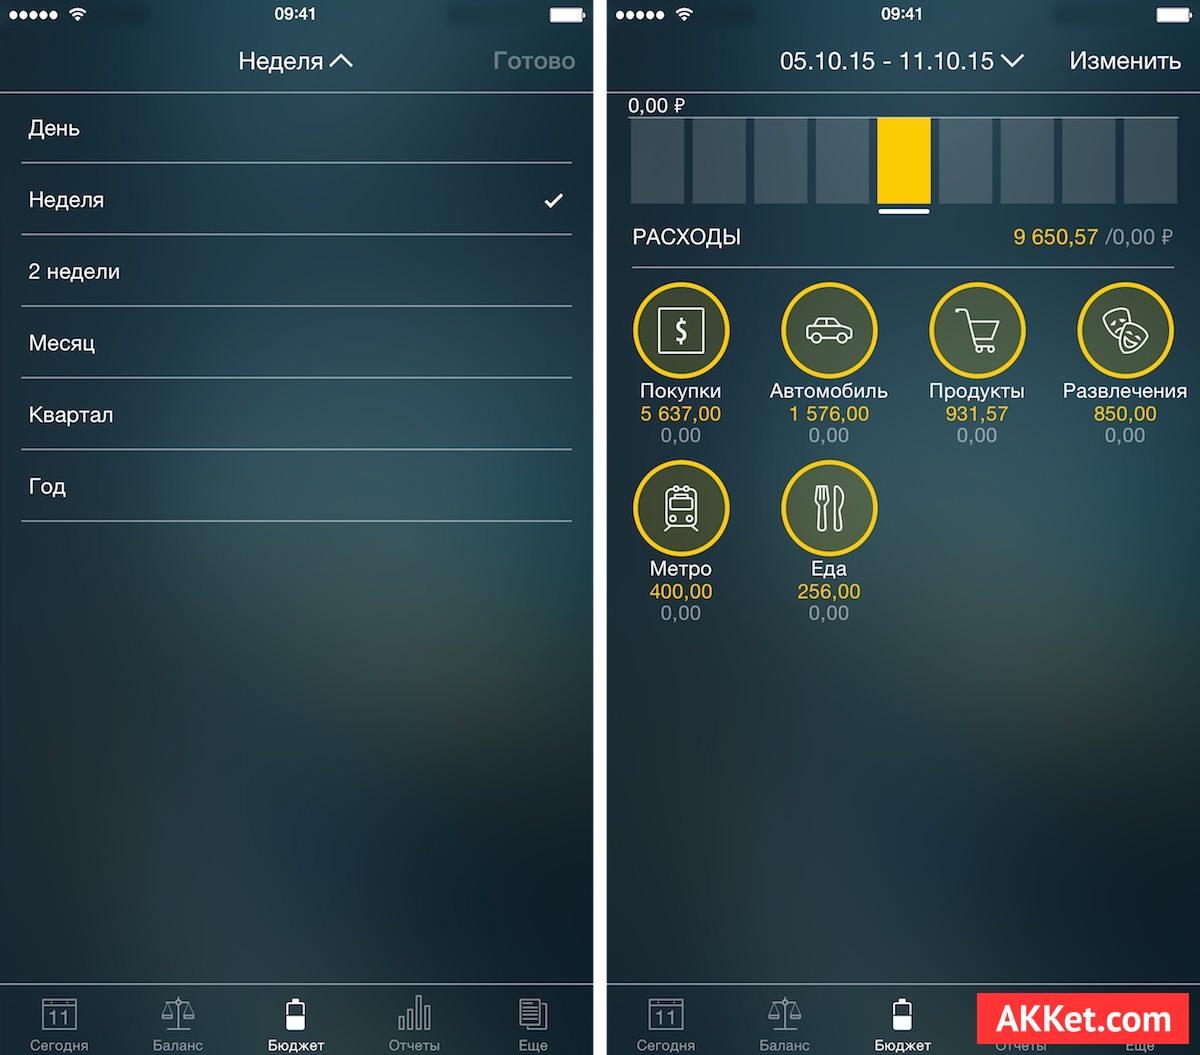 Money Pro akket.com review iOS os x mac iPhone iPad macbook imac pro iPhone 6s plus app store 6